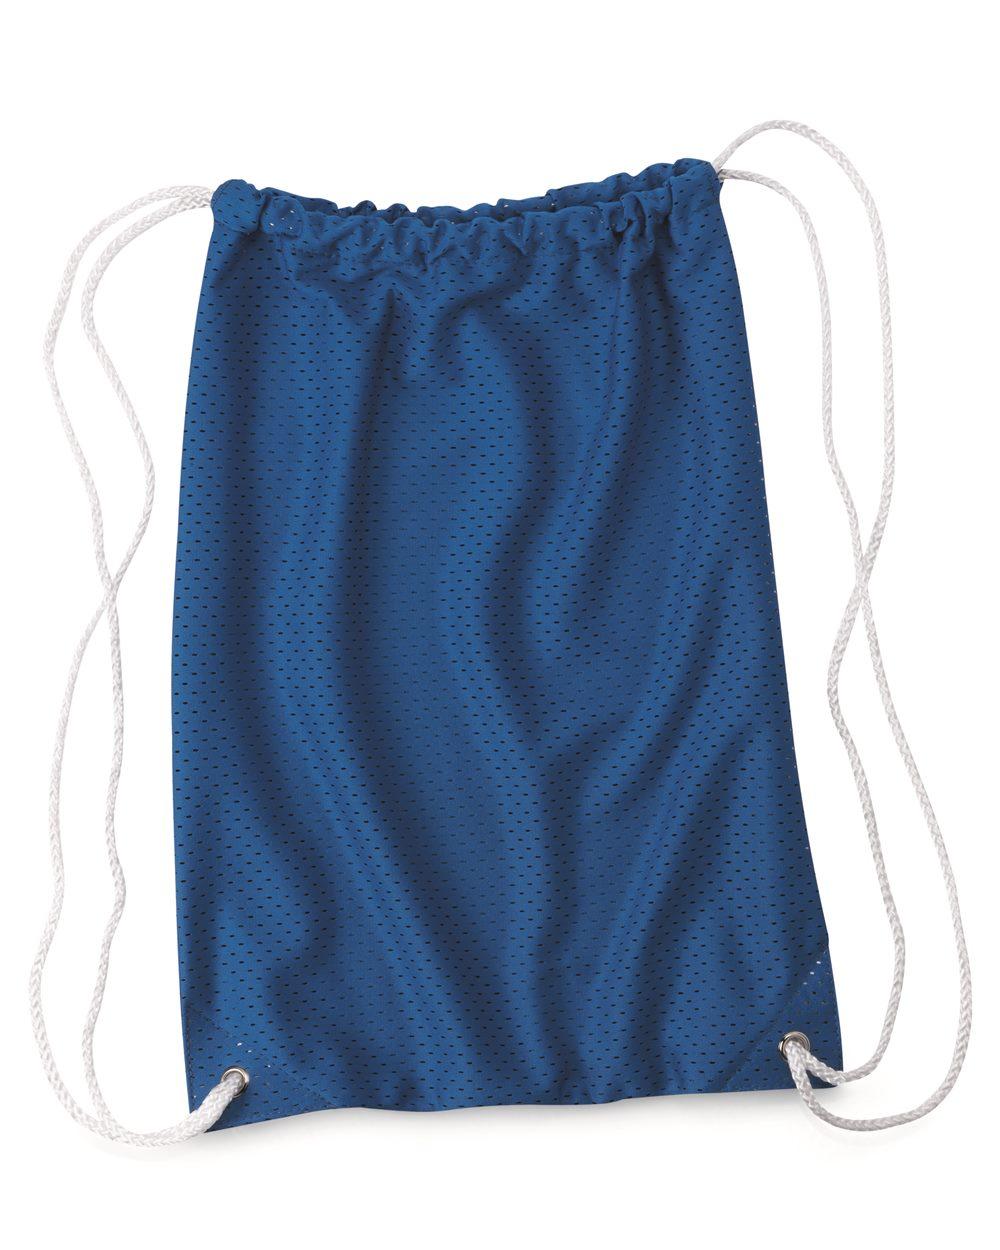 Liberty Bags 8895 - Jersey Mesh Drawstring Backpack